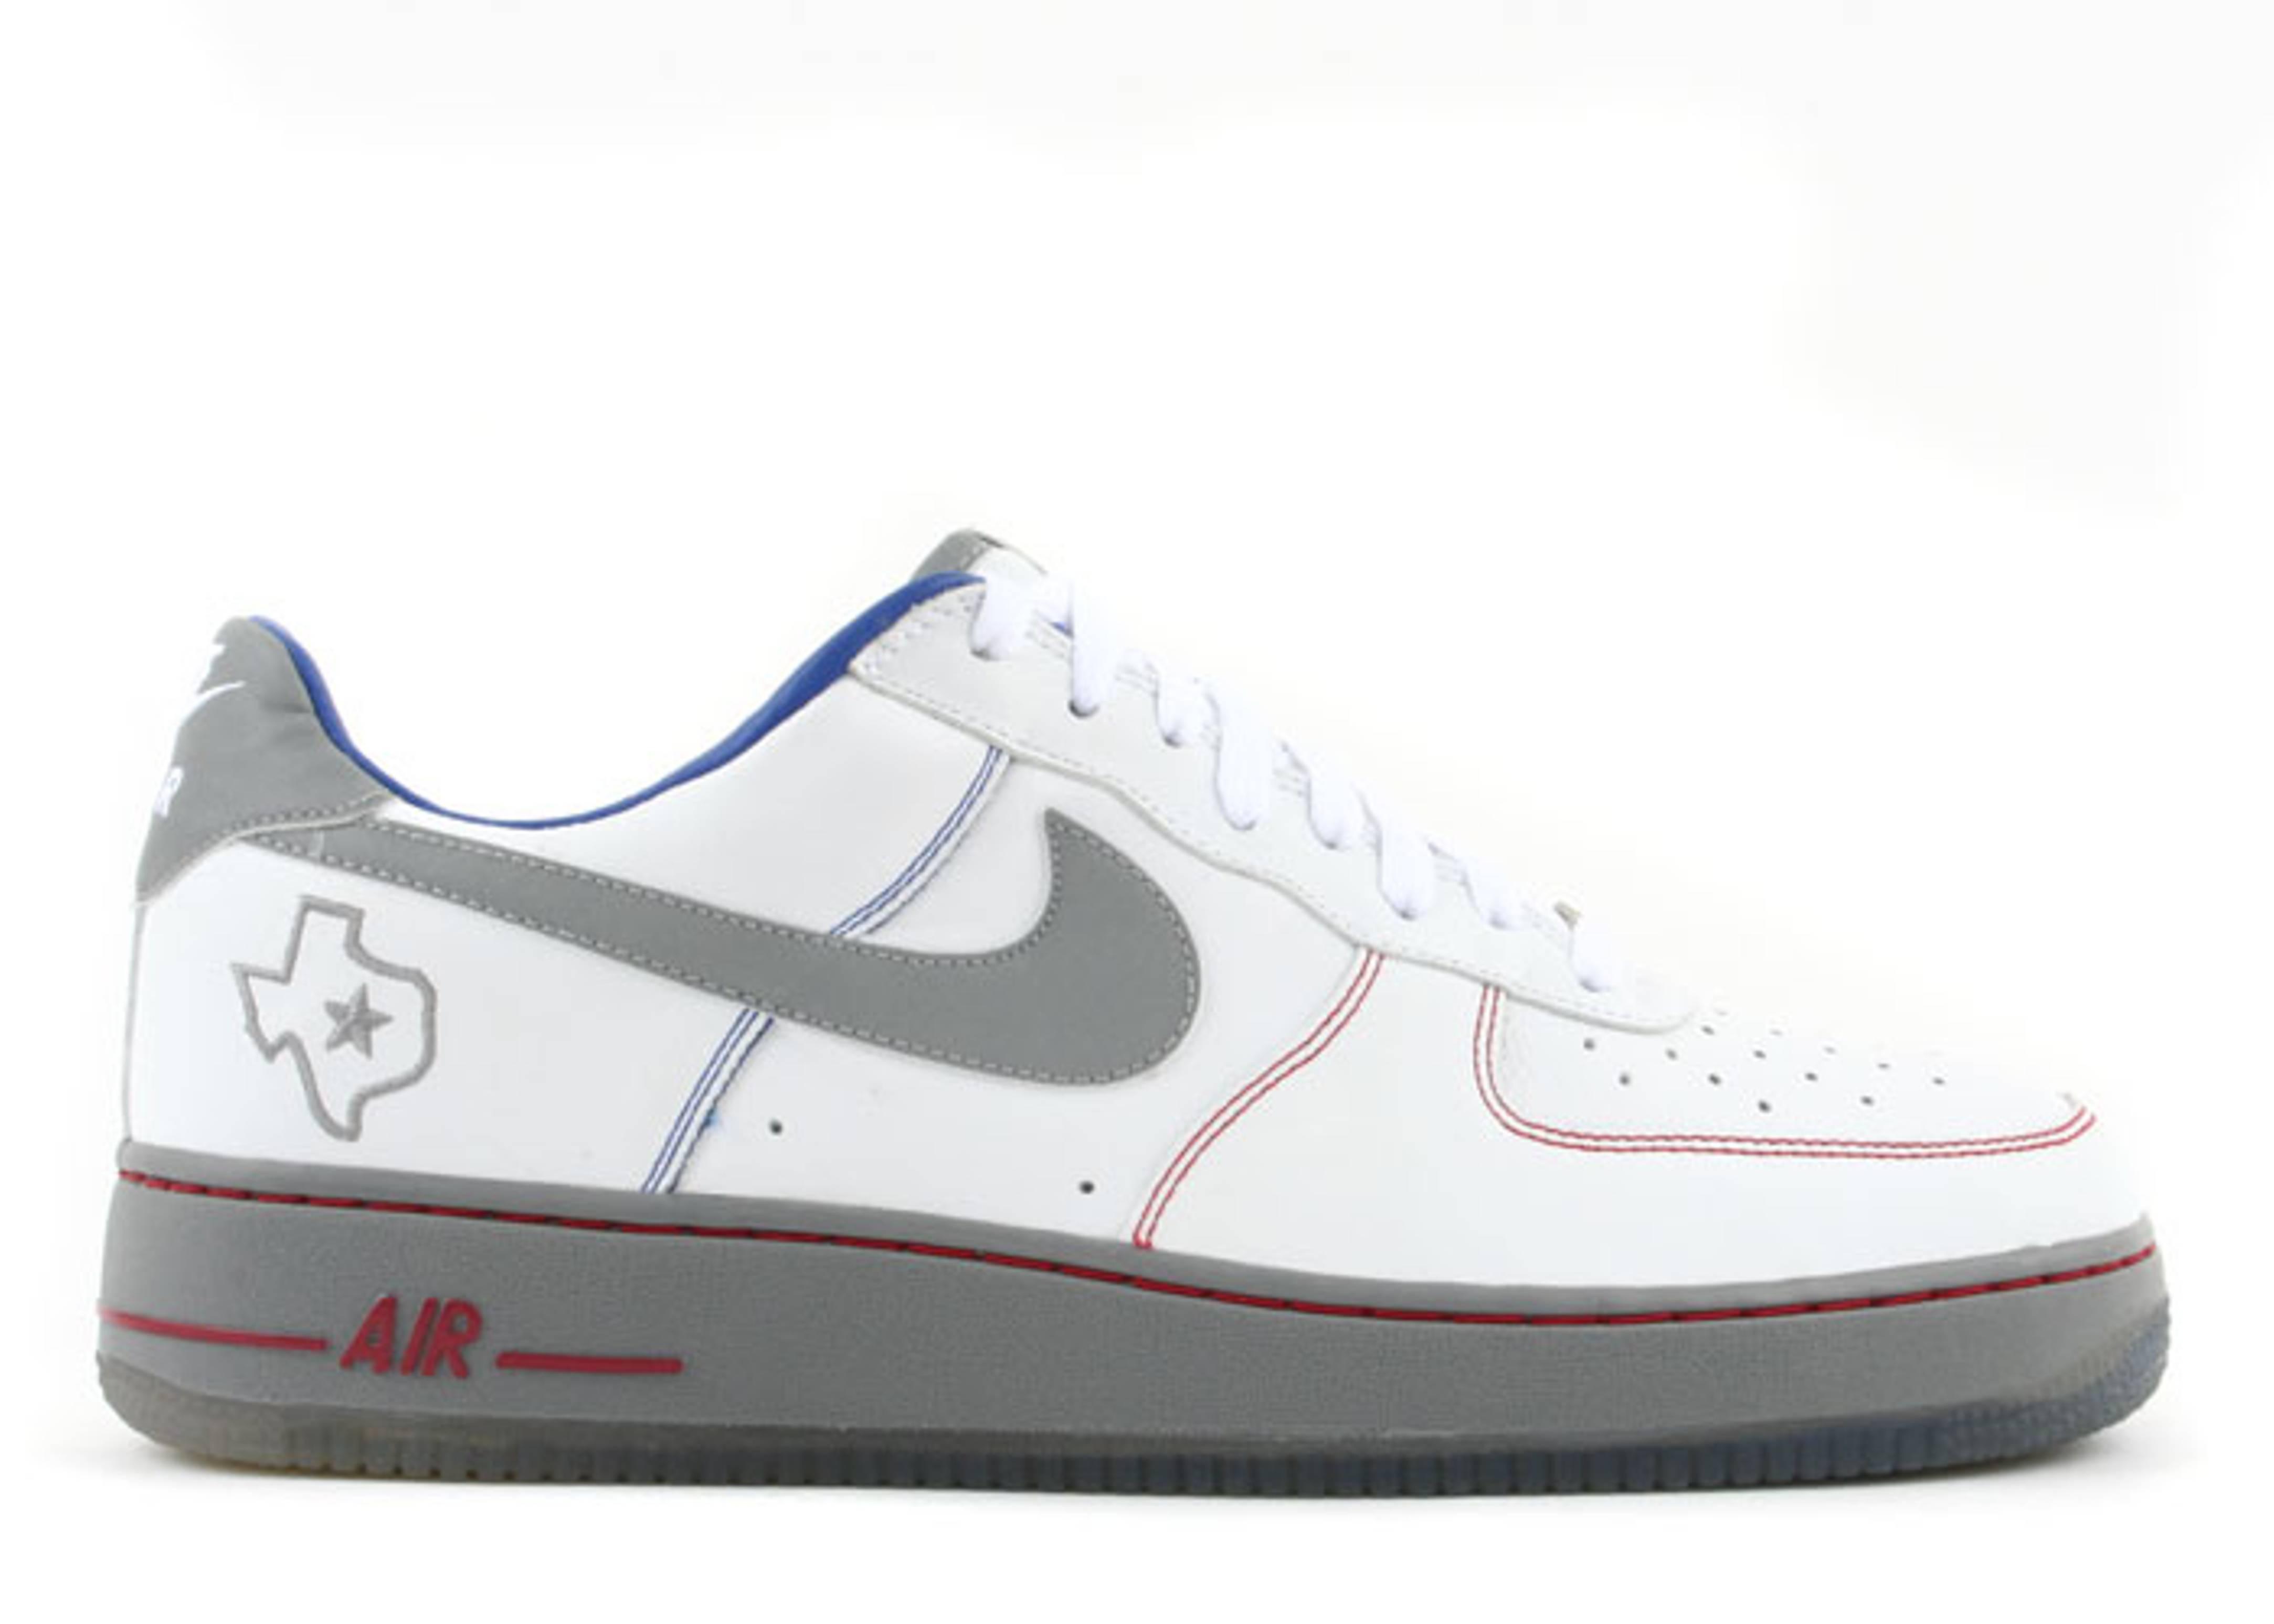 air force 1 low premium white/varsity royal-varsity red